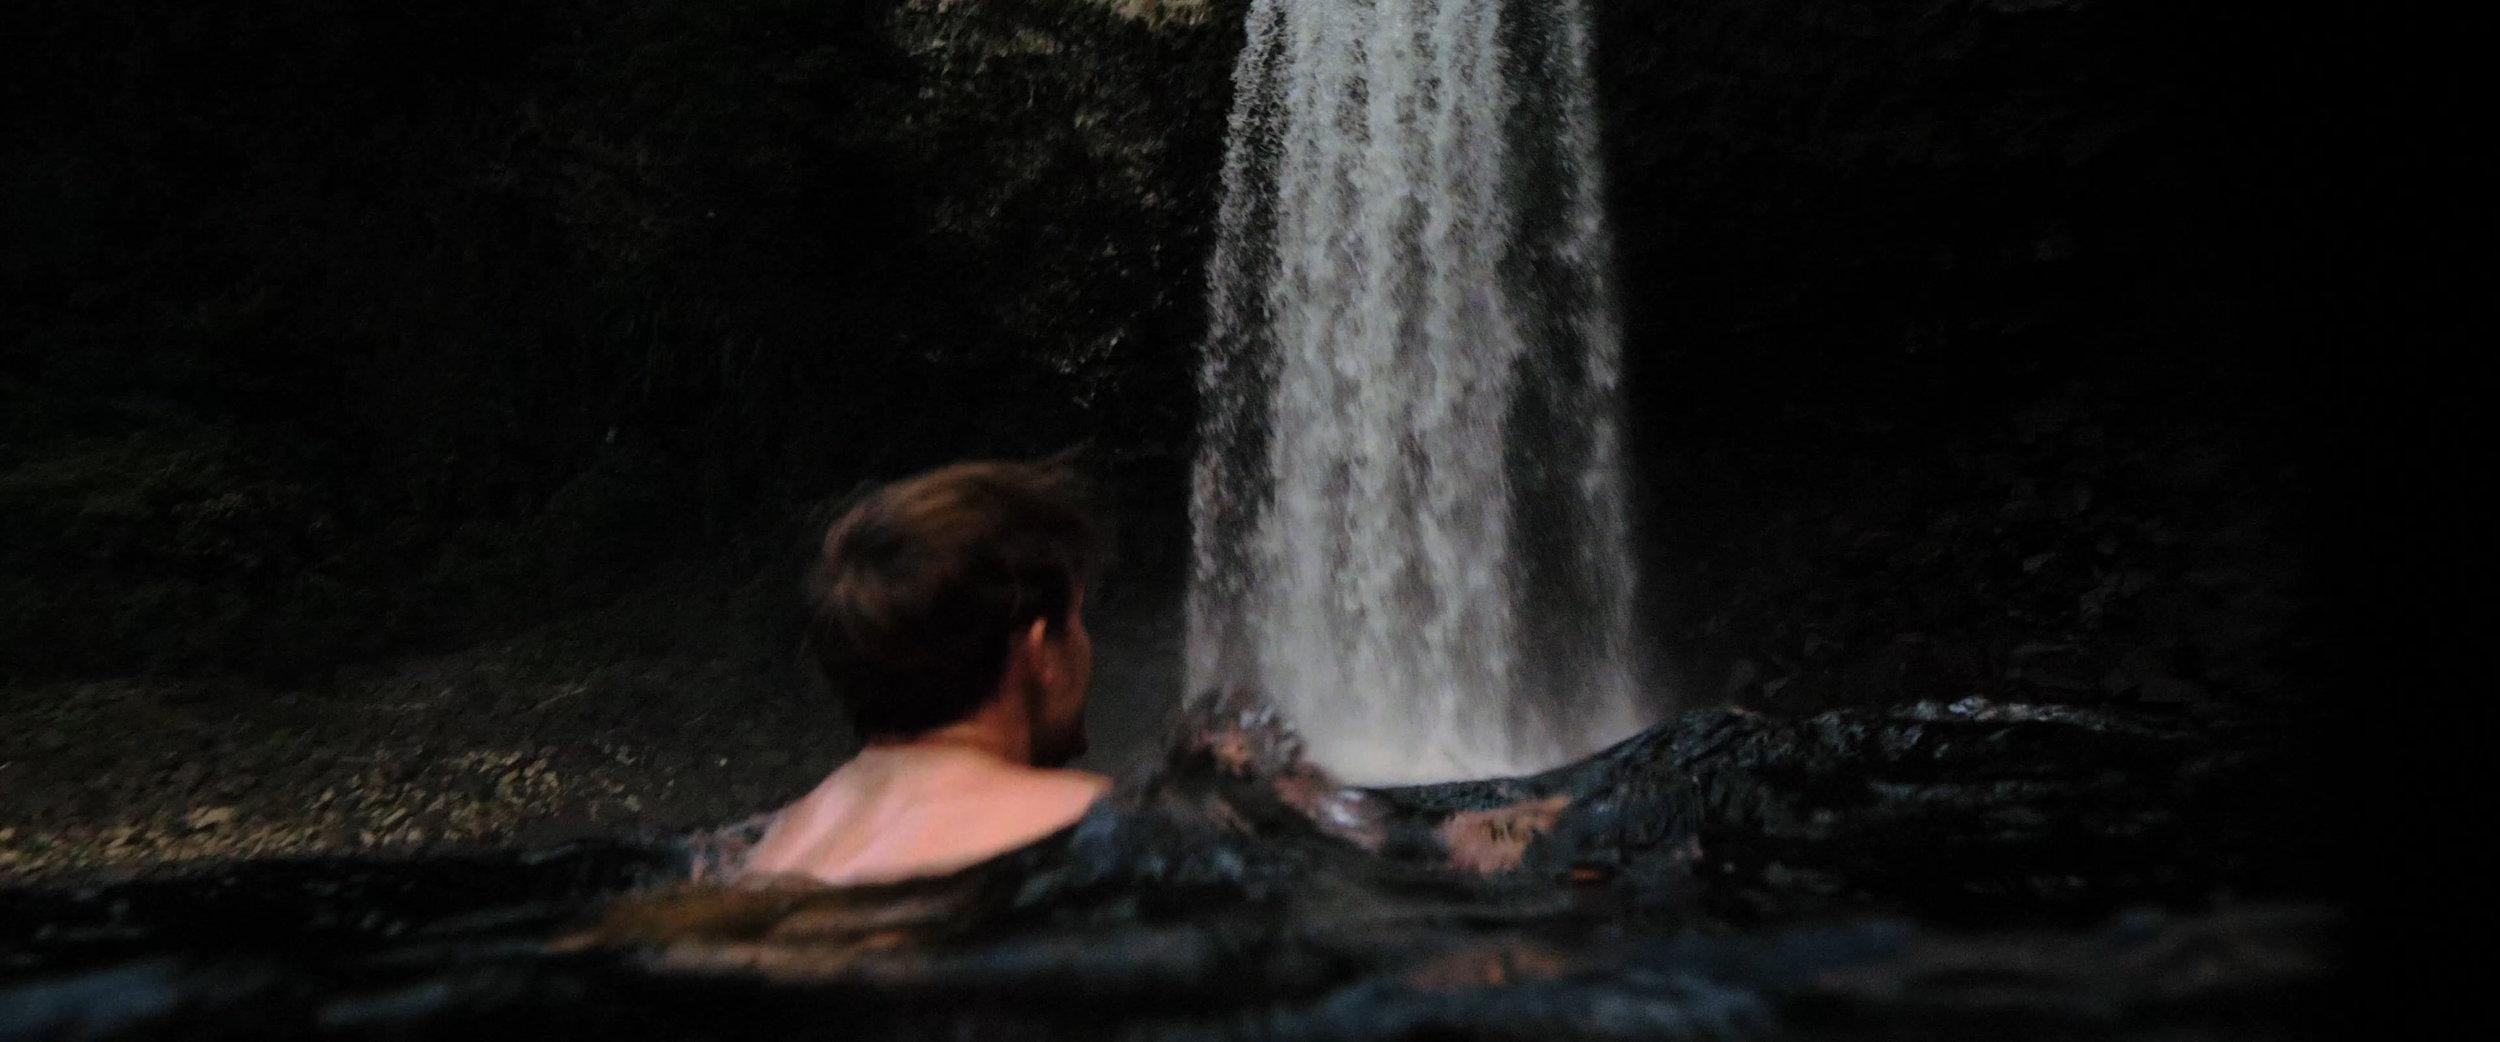 reunion waterfallin_01375.jpg